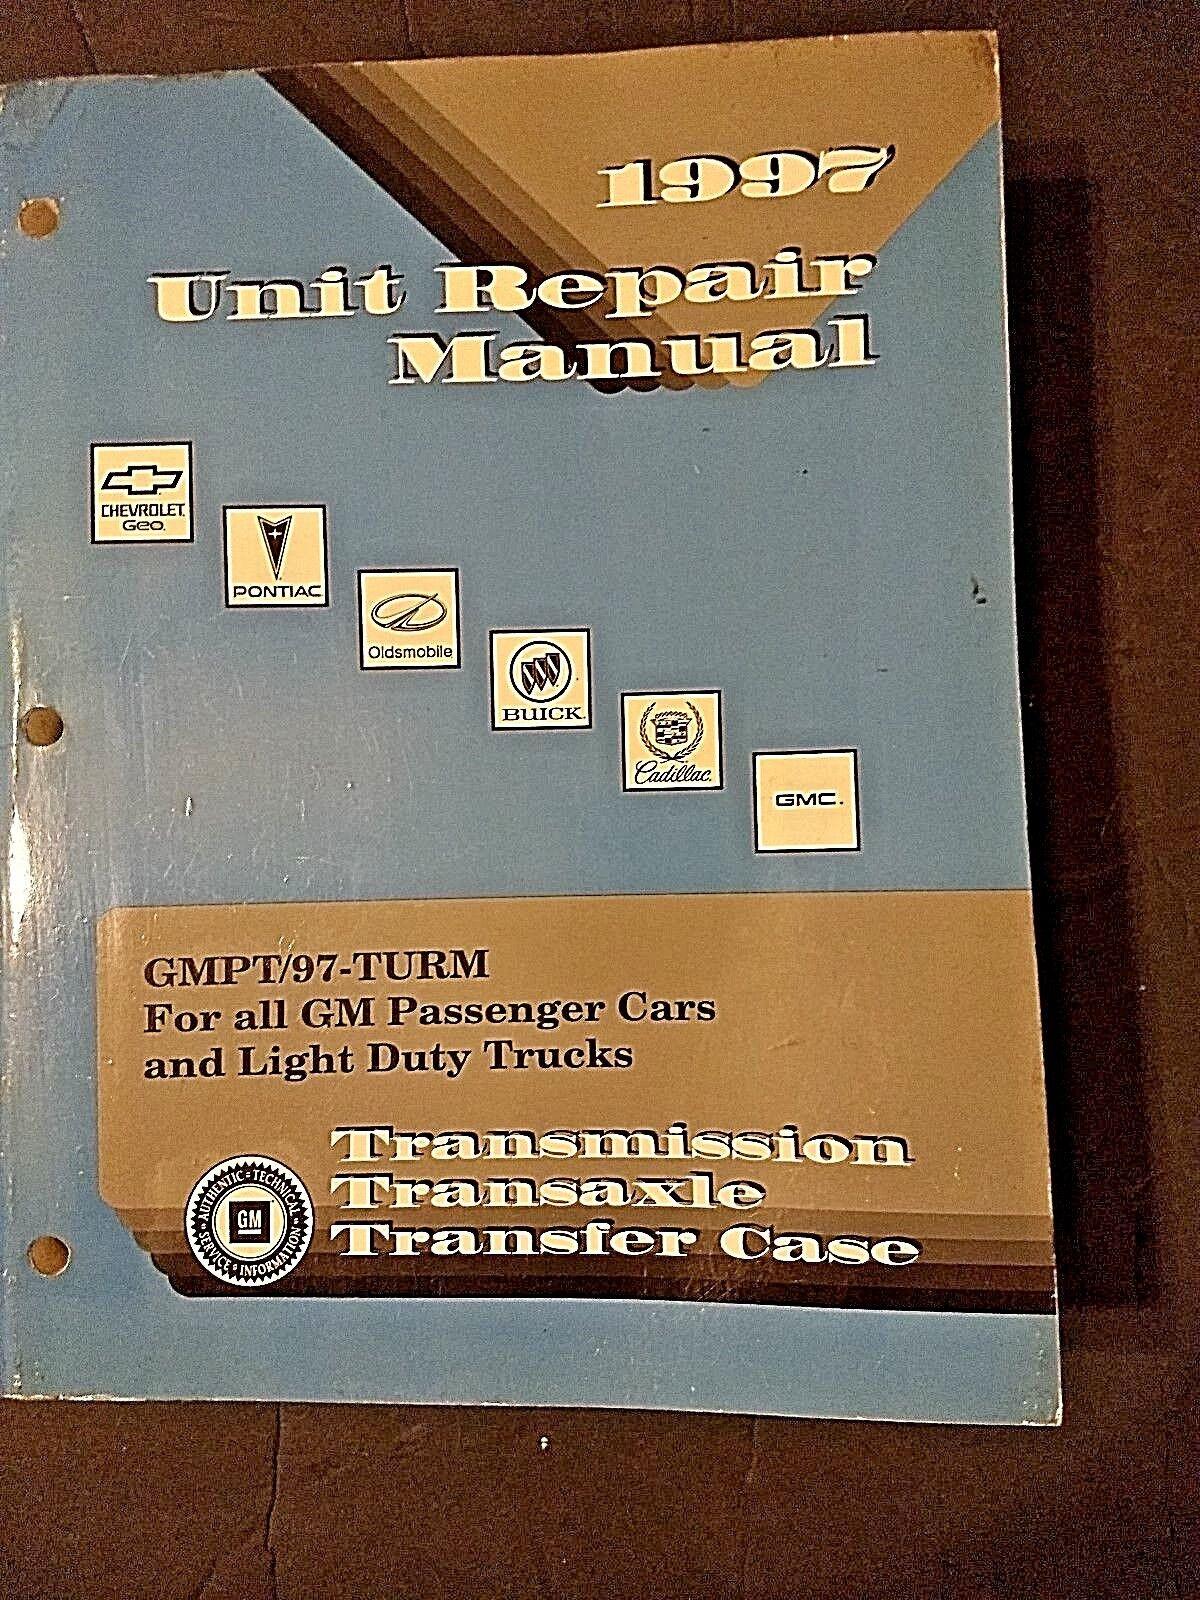 1997 Transmission Transaxle Transfer Case Unit Repair Manual GM Cars and Trucks